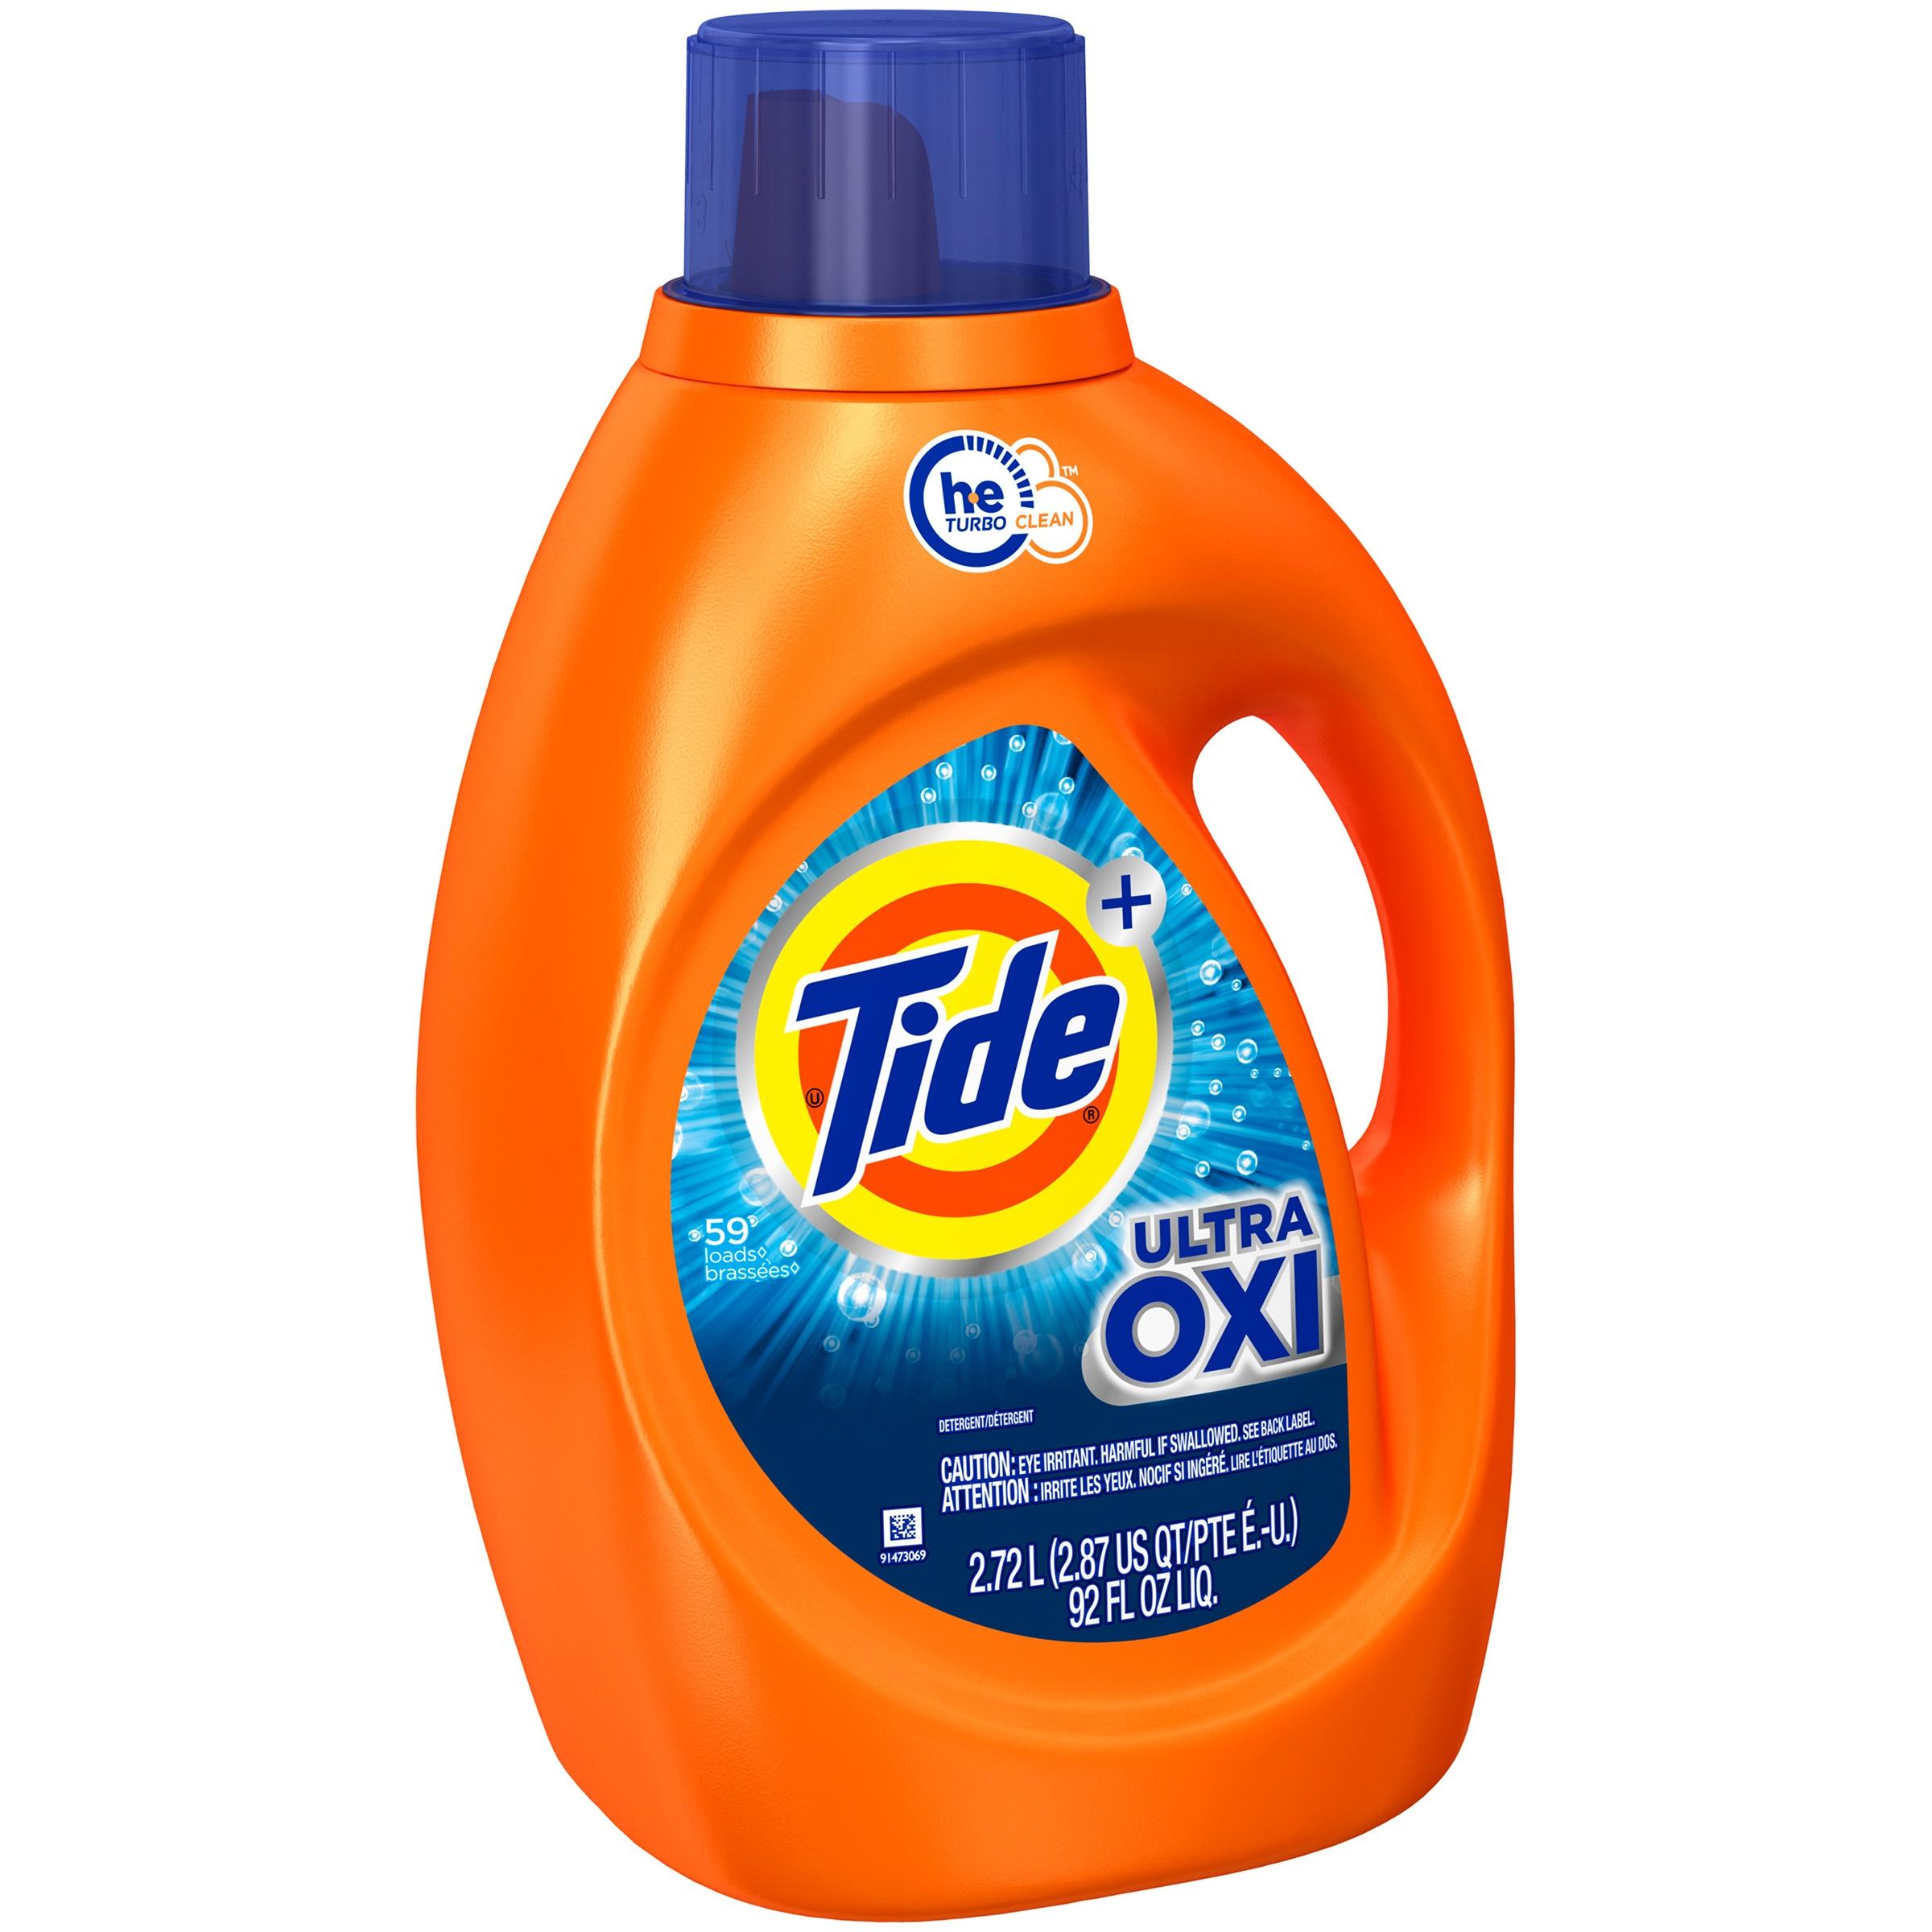 Tide Plus Ultra Oxi Liquid Laundry Detergent - 92 fl oz